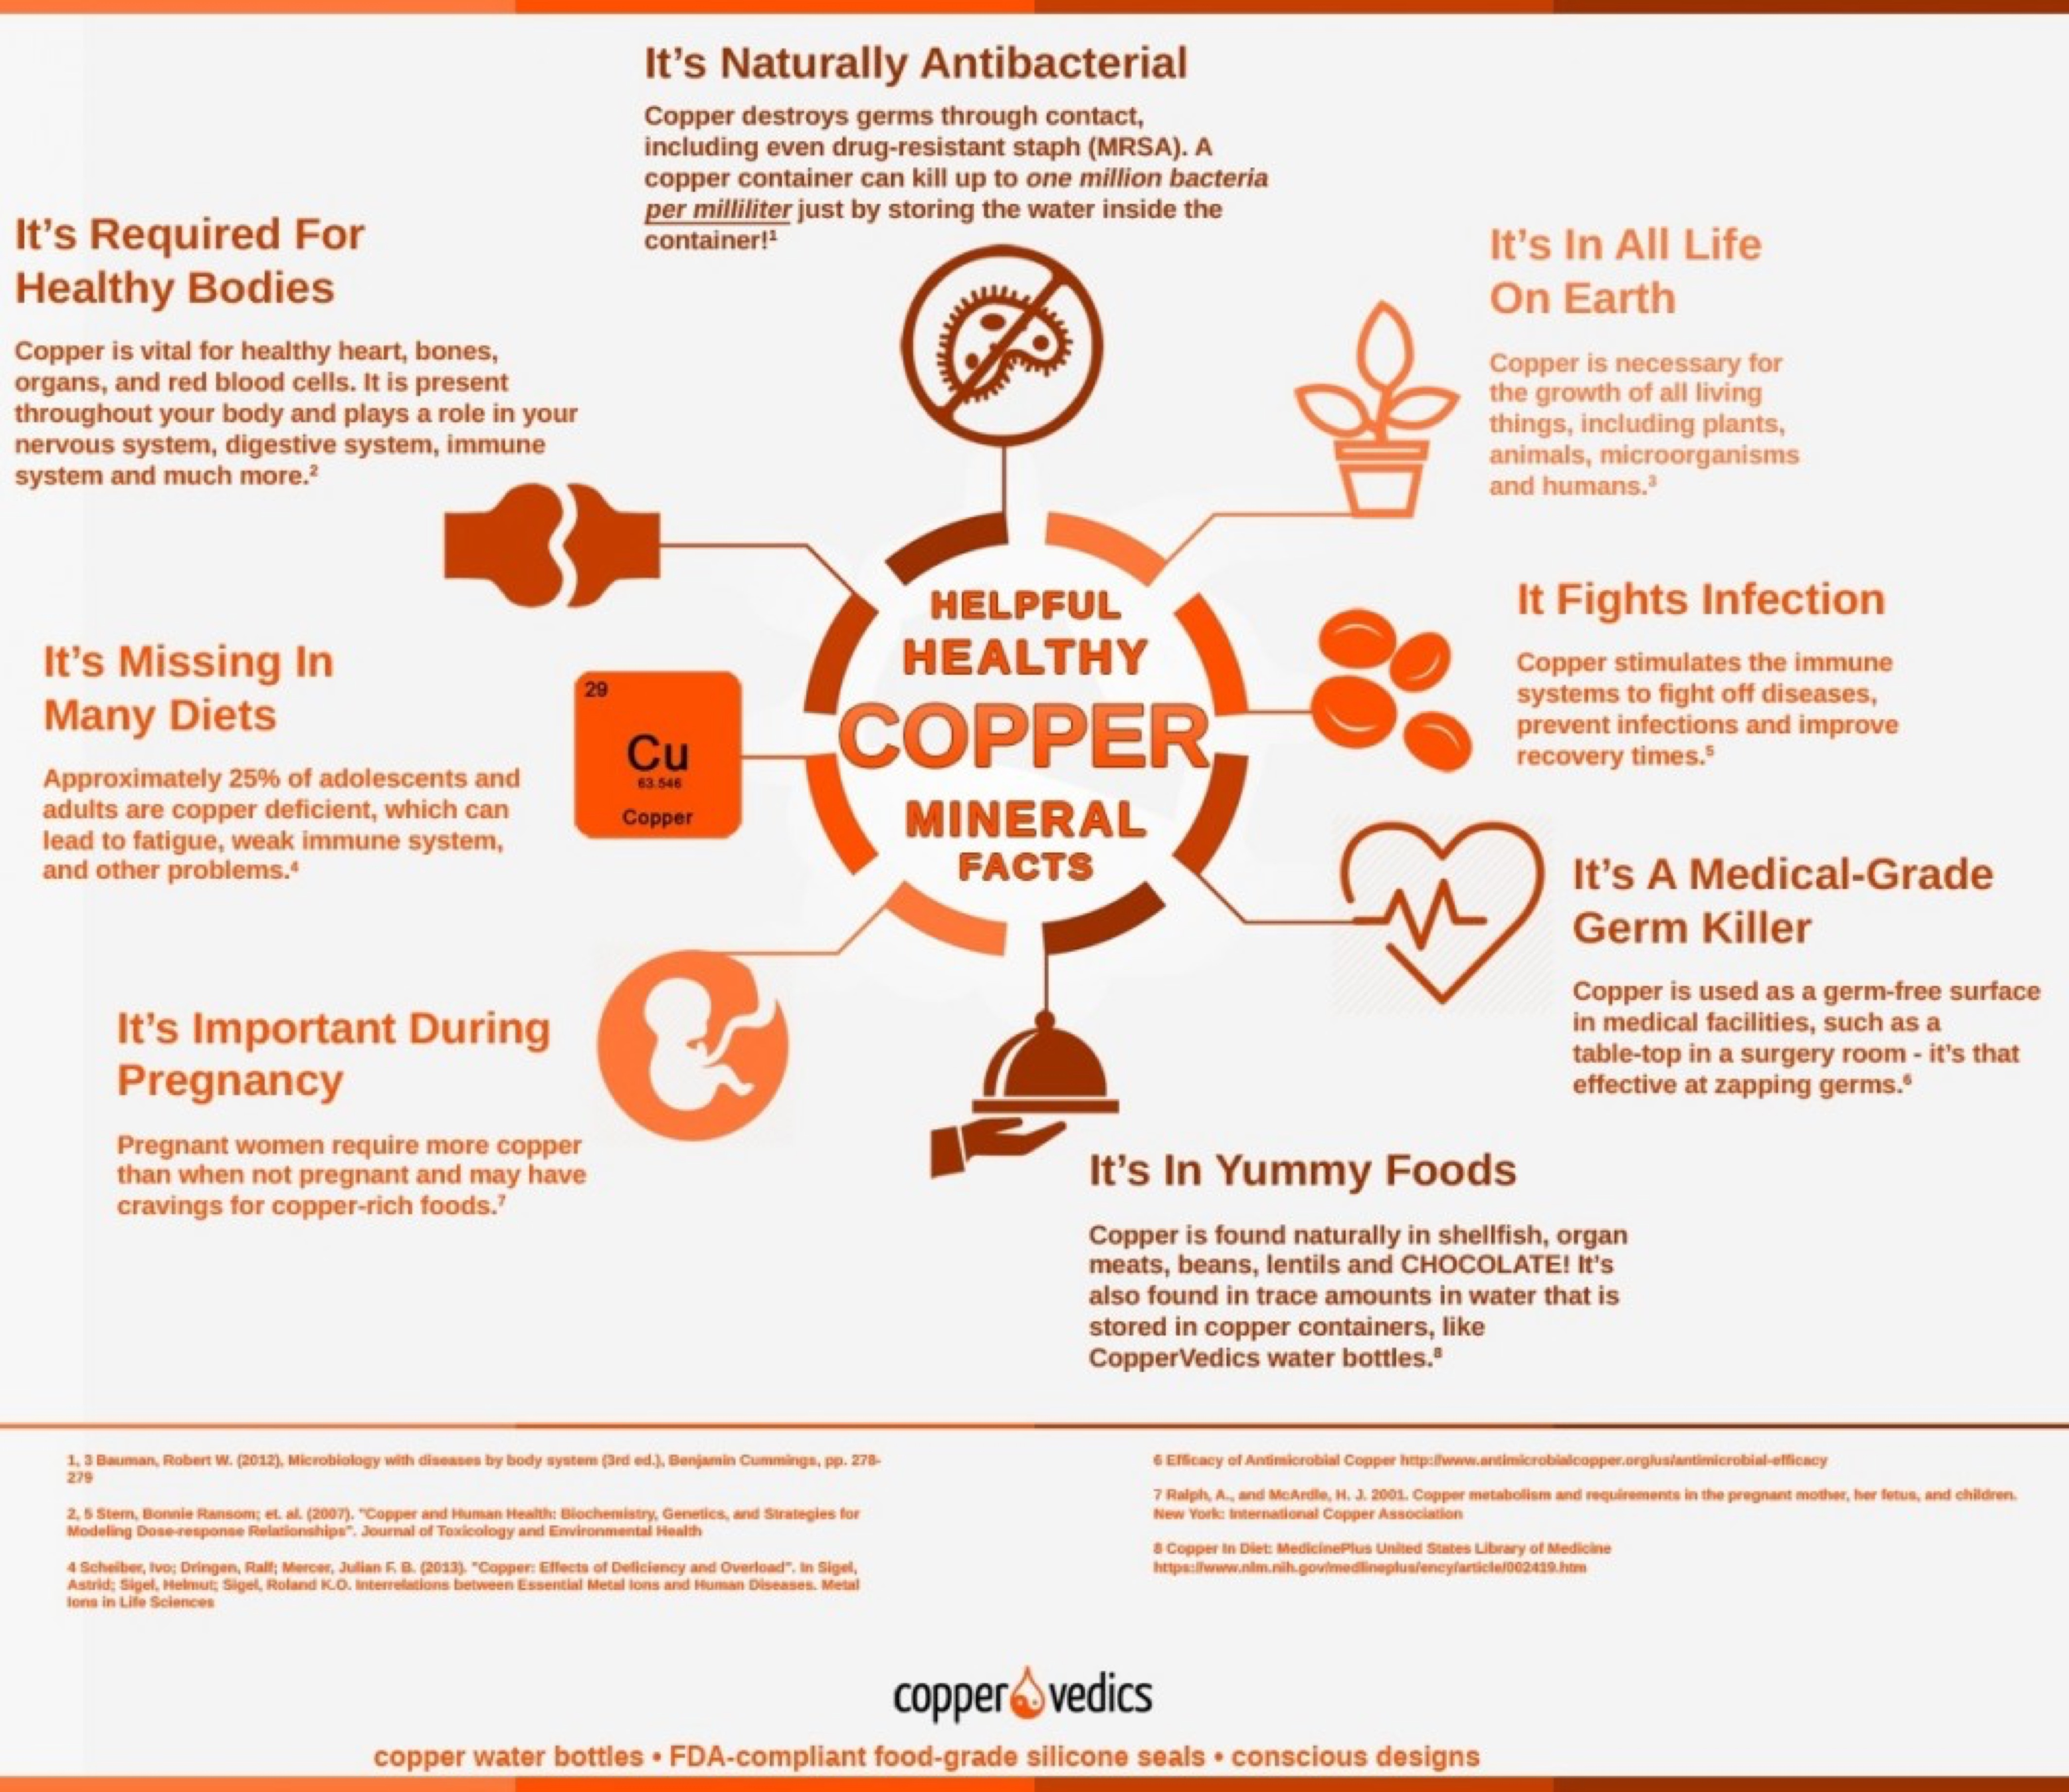 copper-health-infographic (1)